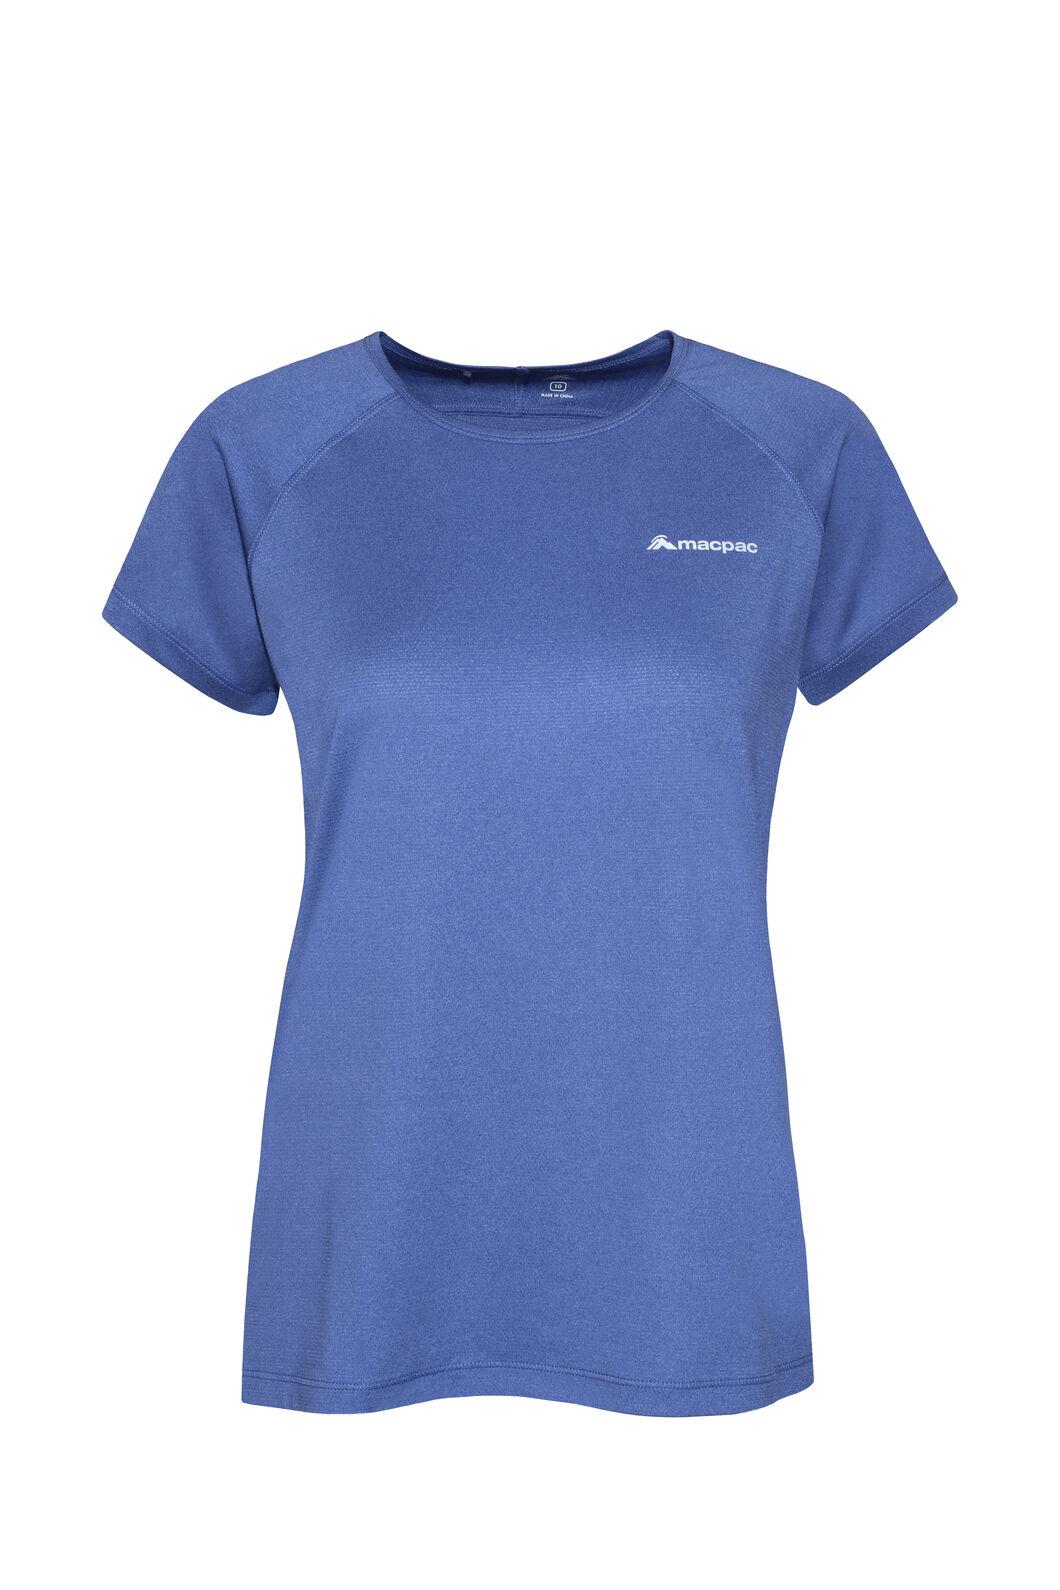 Macpac Eyre Short Sleeve Tee — Women's, Marlin, hi-res